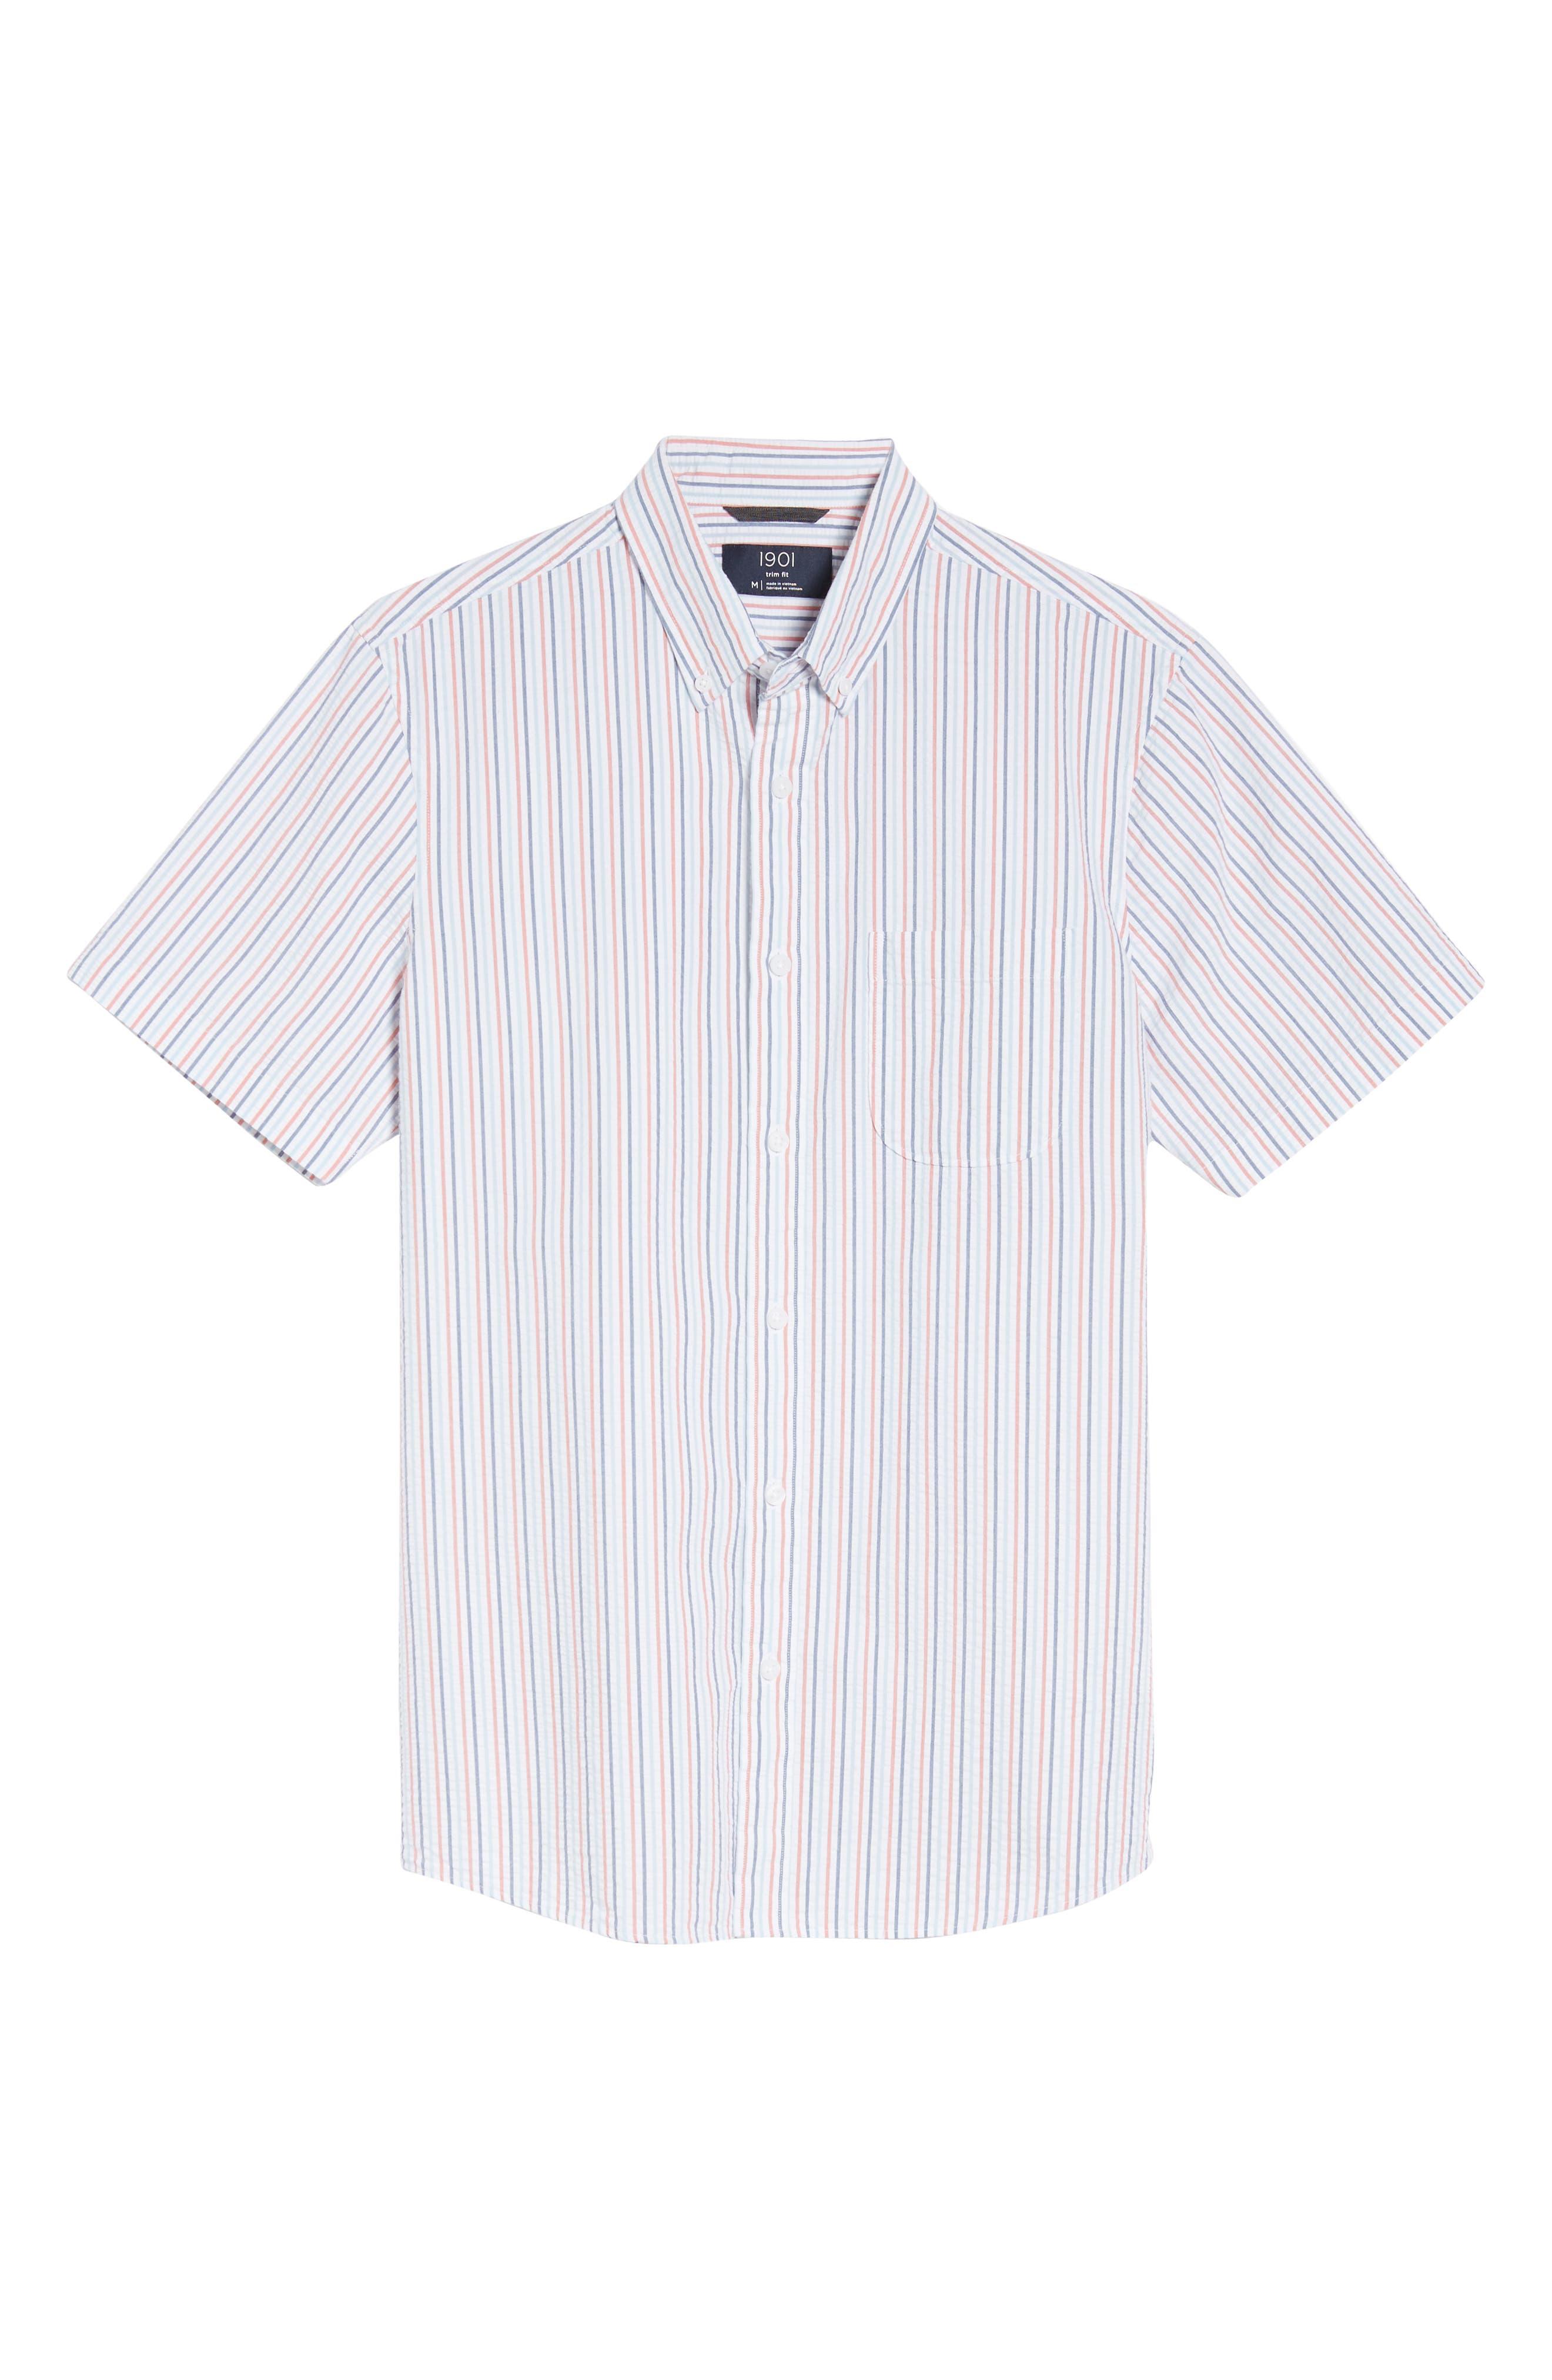 Trim Fit Seersucker Short Sleeve Sport Shirt,                             Alternate thumbnail 6, color,                             WHITE MULTI PENCIL STRIPE